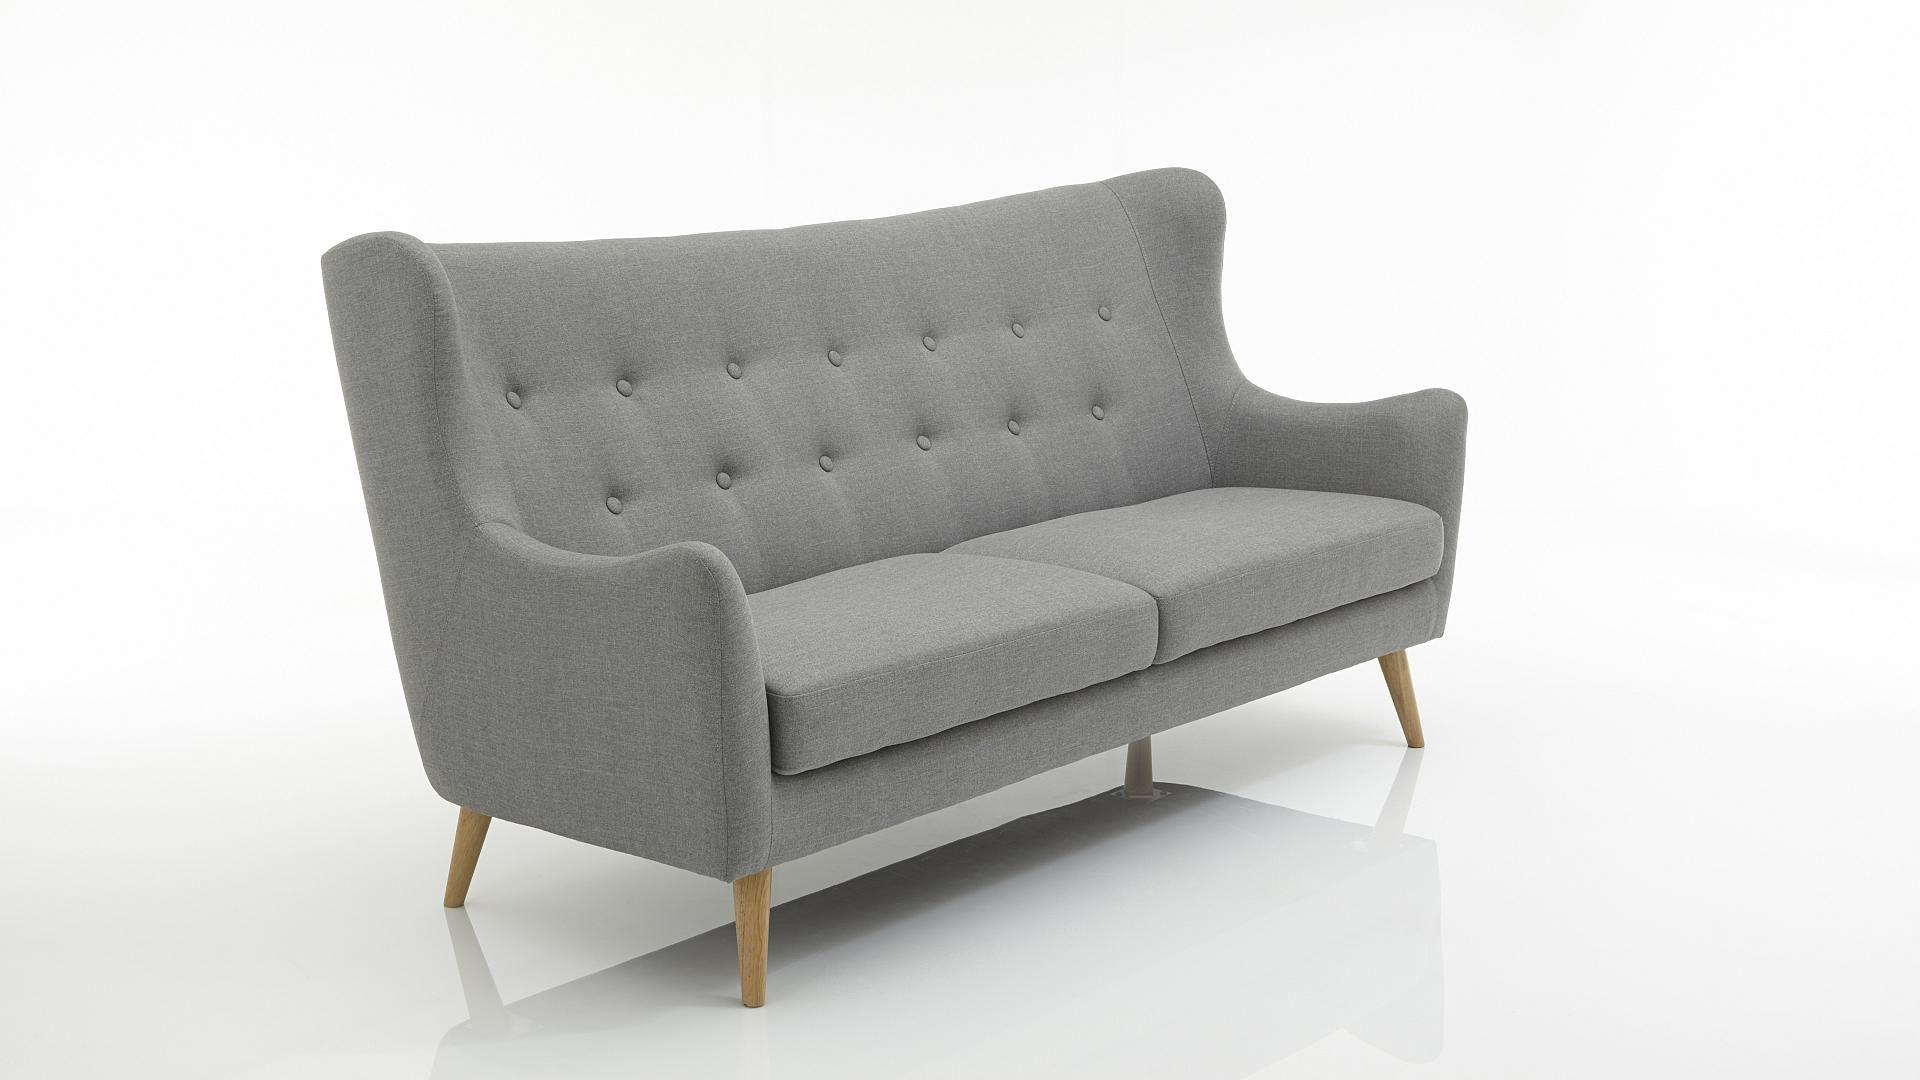 das fr hliche m saarlouis m bel a z couches sofas 3 sitzer sofa actona 3 sitzer sofa. Black Bedroom Furniture Sets. Home Design Ideas